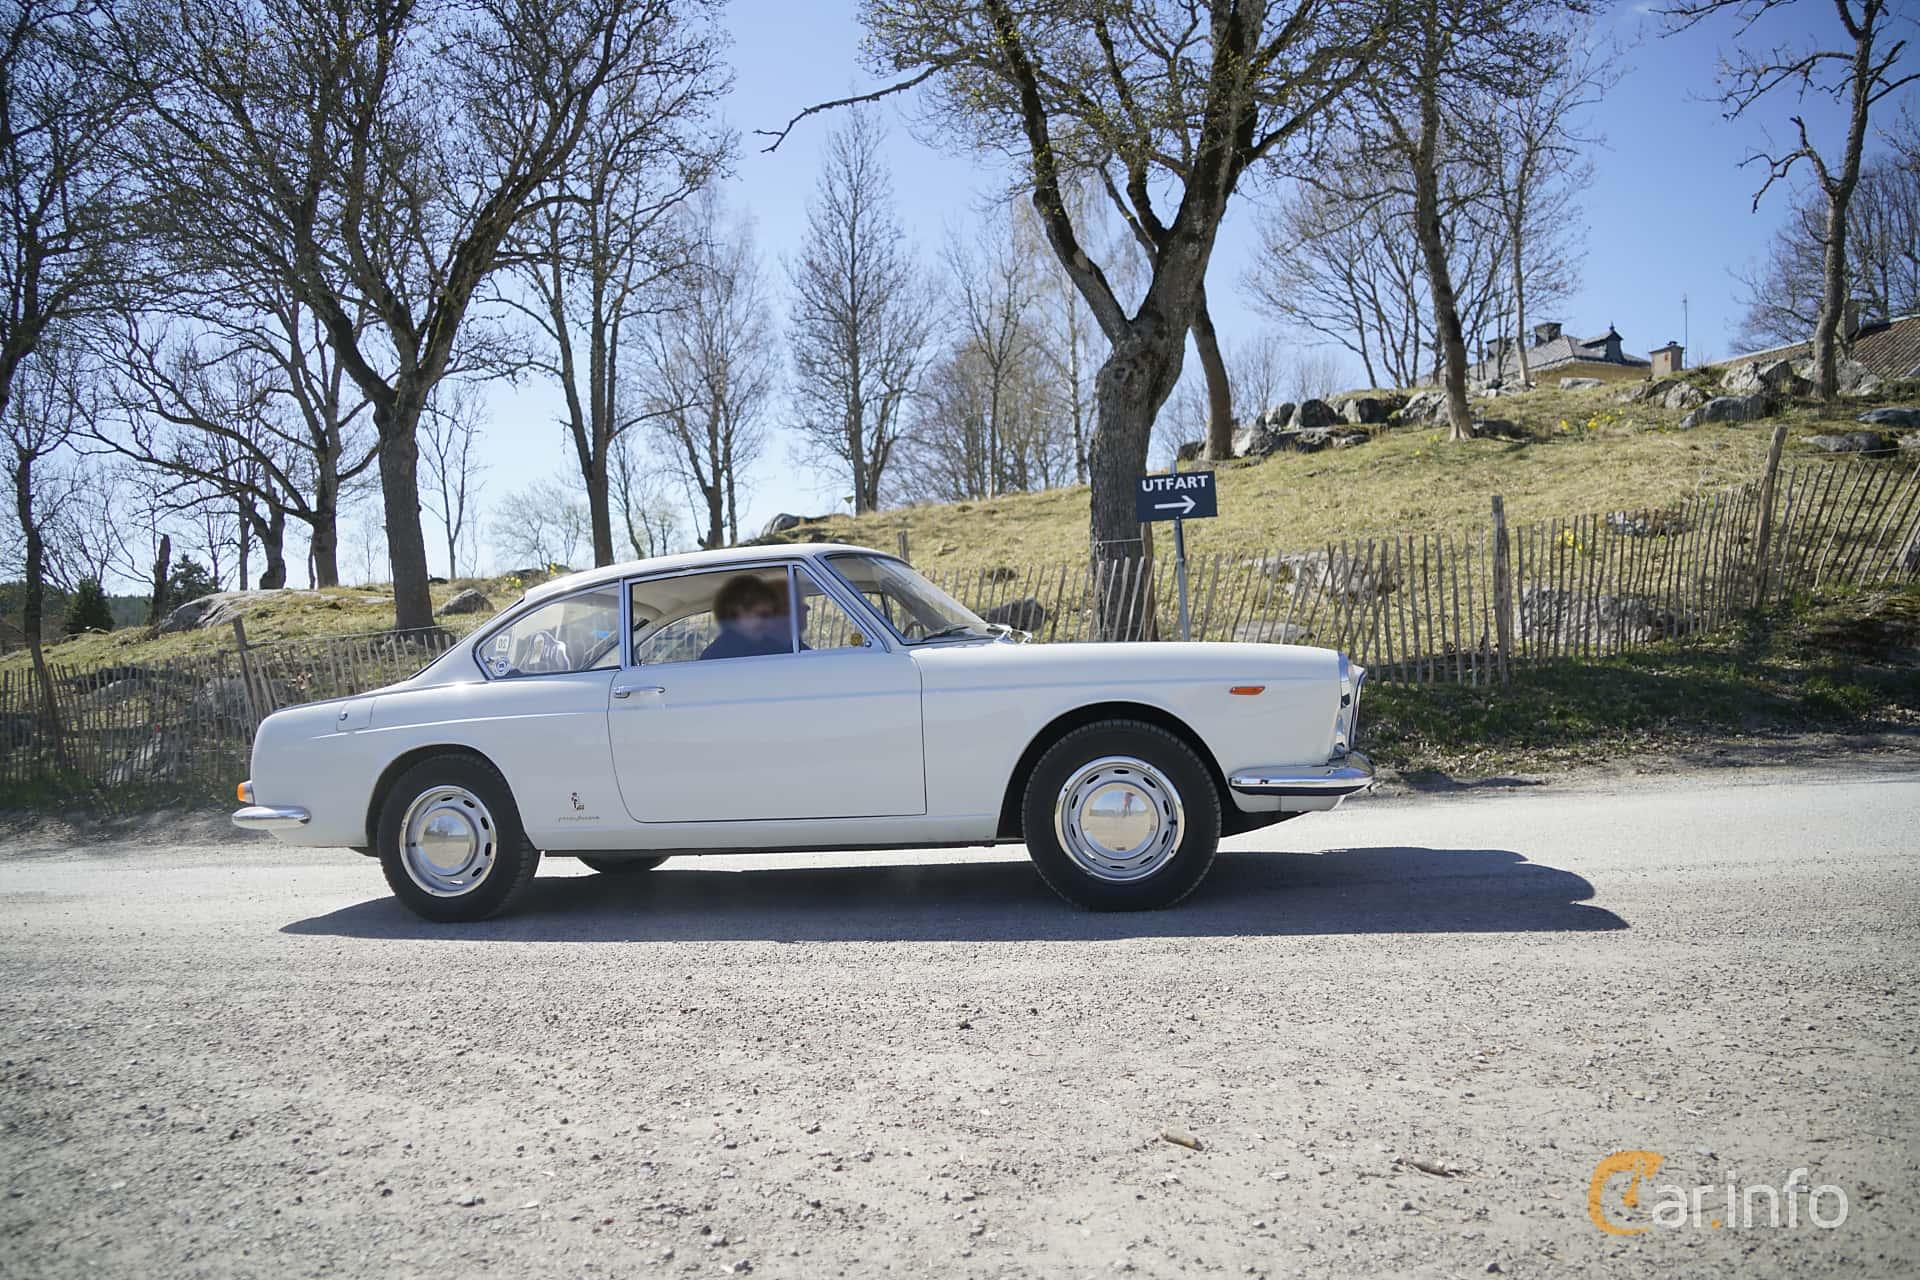 Lancia flavia vanachro Image collections